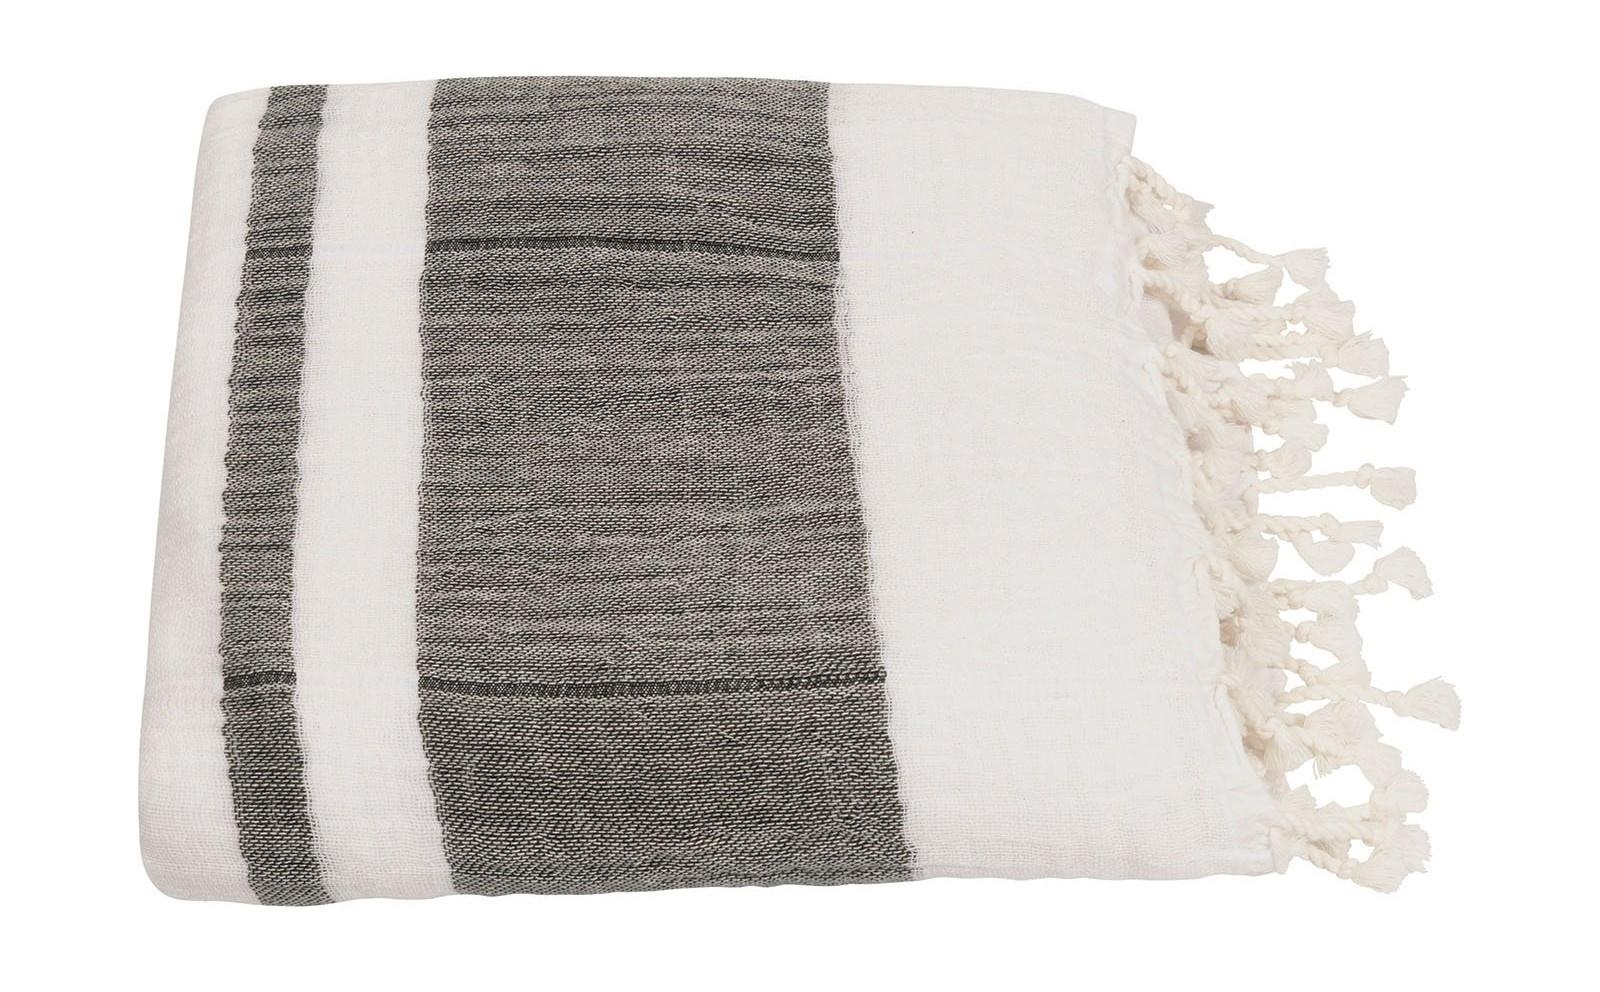 Handdoek hamam towel white-1